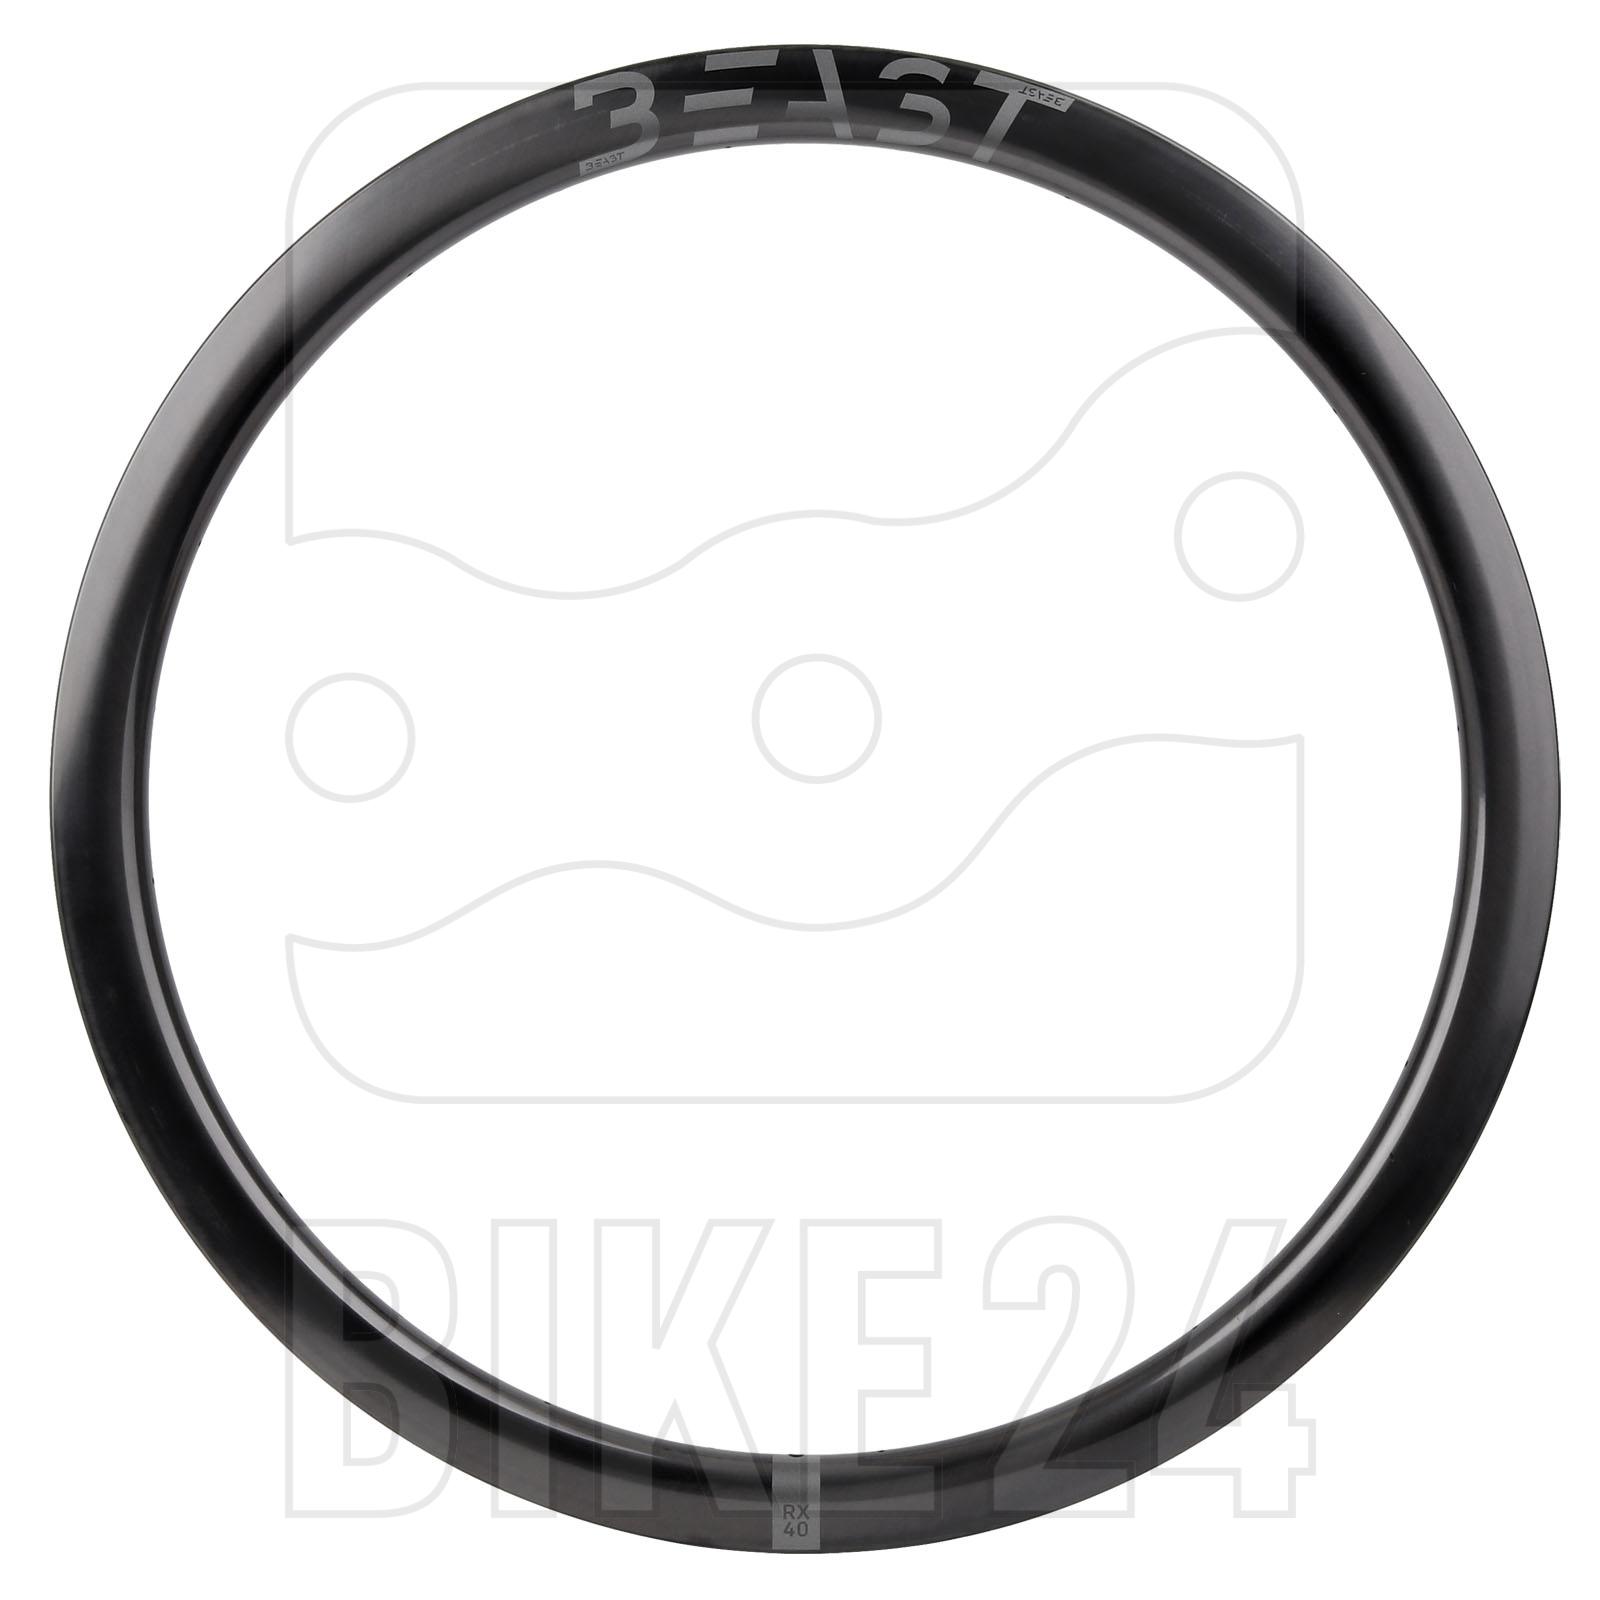 Image of Beast Components RX40 Carbon Disc Clincher Rim - 21-622 - 24 Hole - UD black